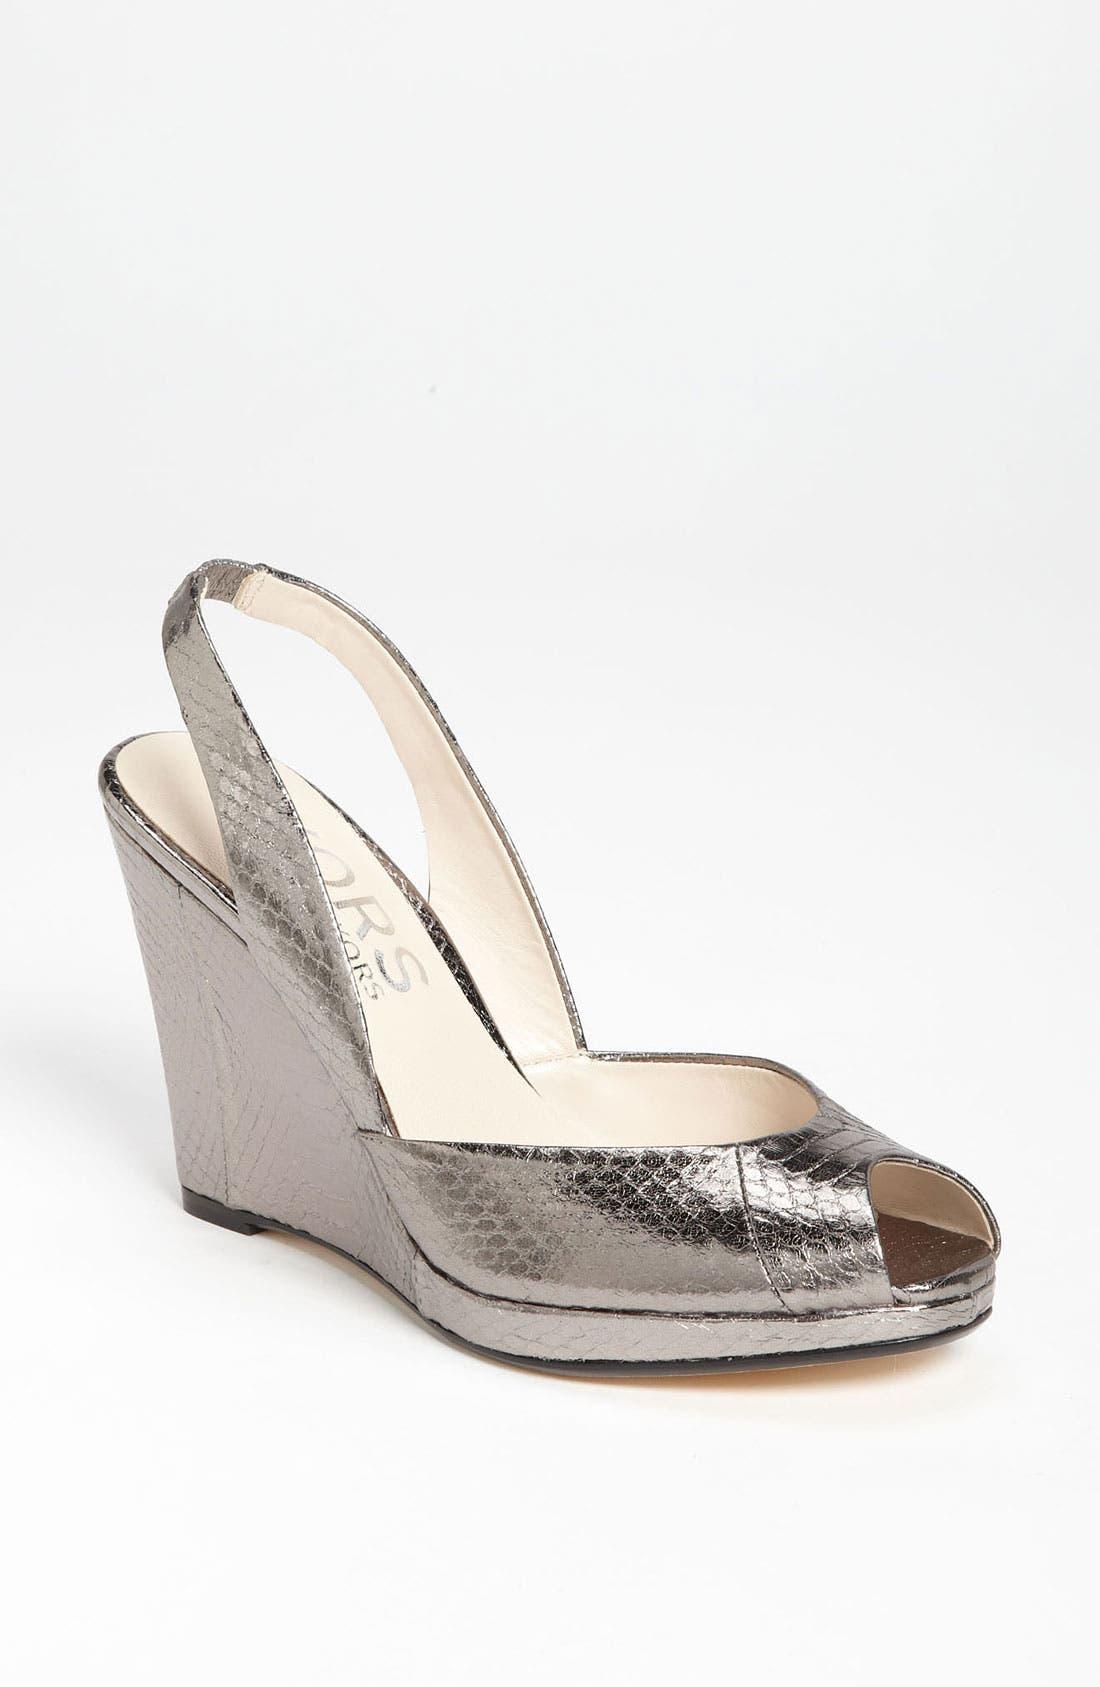 Alternate Image 1 Selected - KORS Michael Kors 'Vivian' Sandal